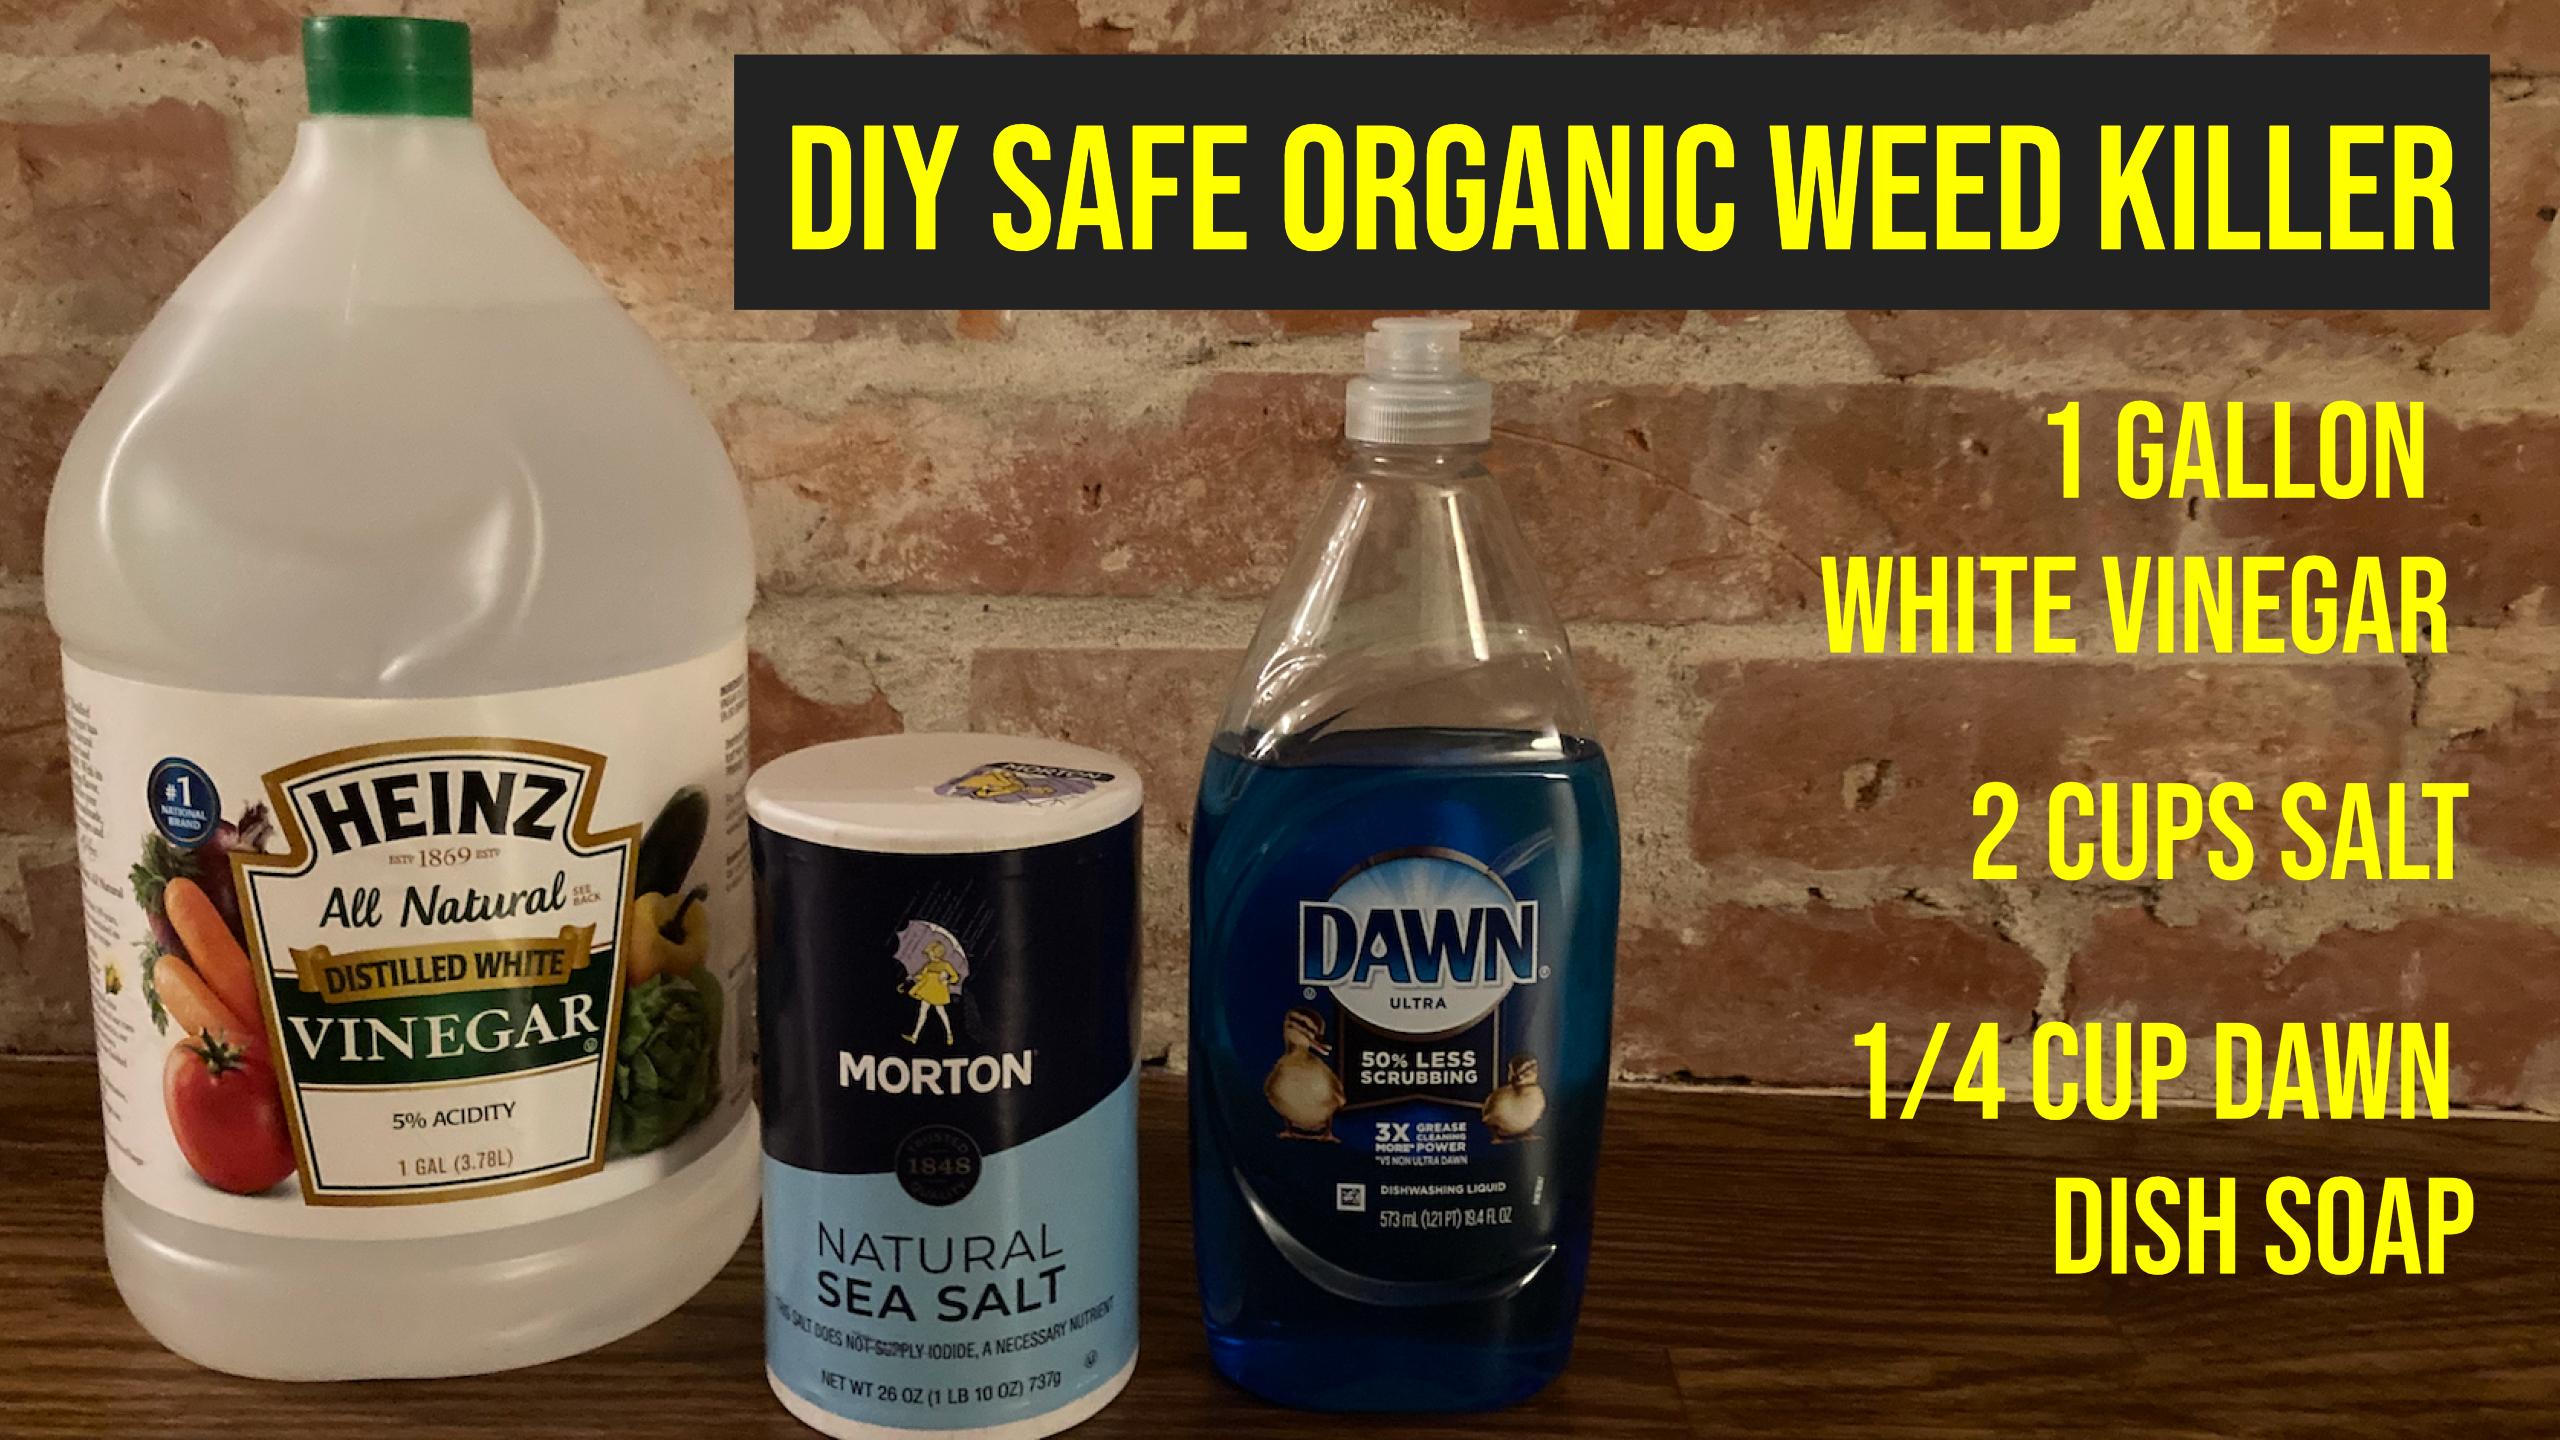 Hawkeye's Latest DIY Video – His Safe Homemade Weed Killer